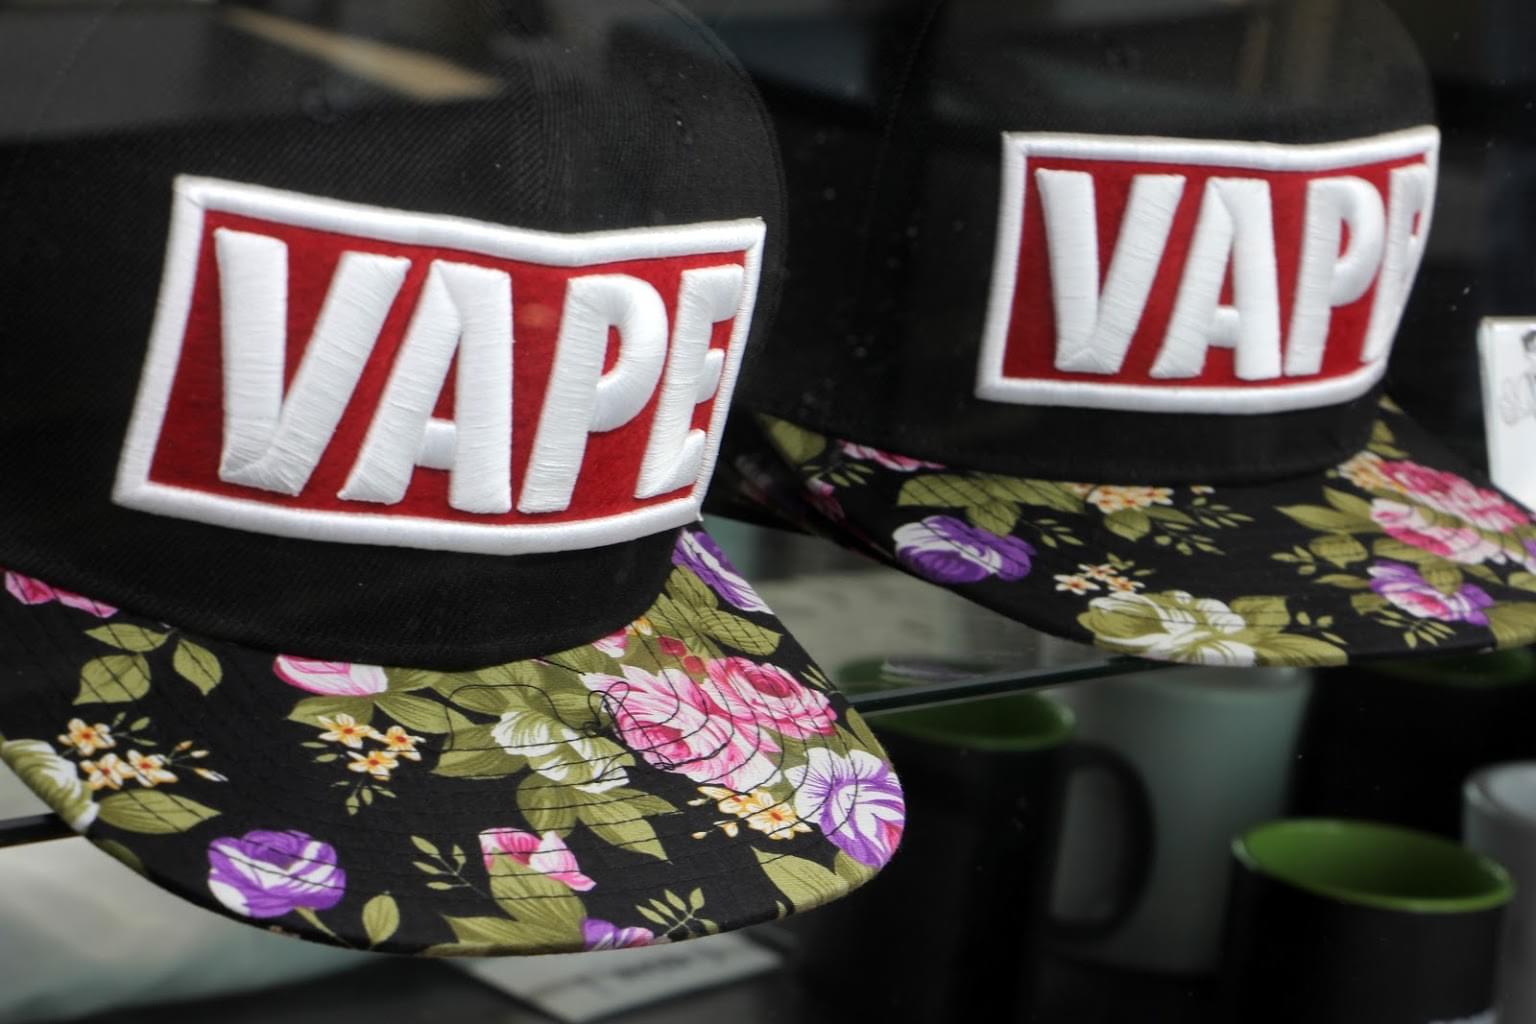 Good Guy Vapes – North Plainfield, NJ – See-Inside Vaporizer Store